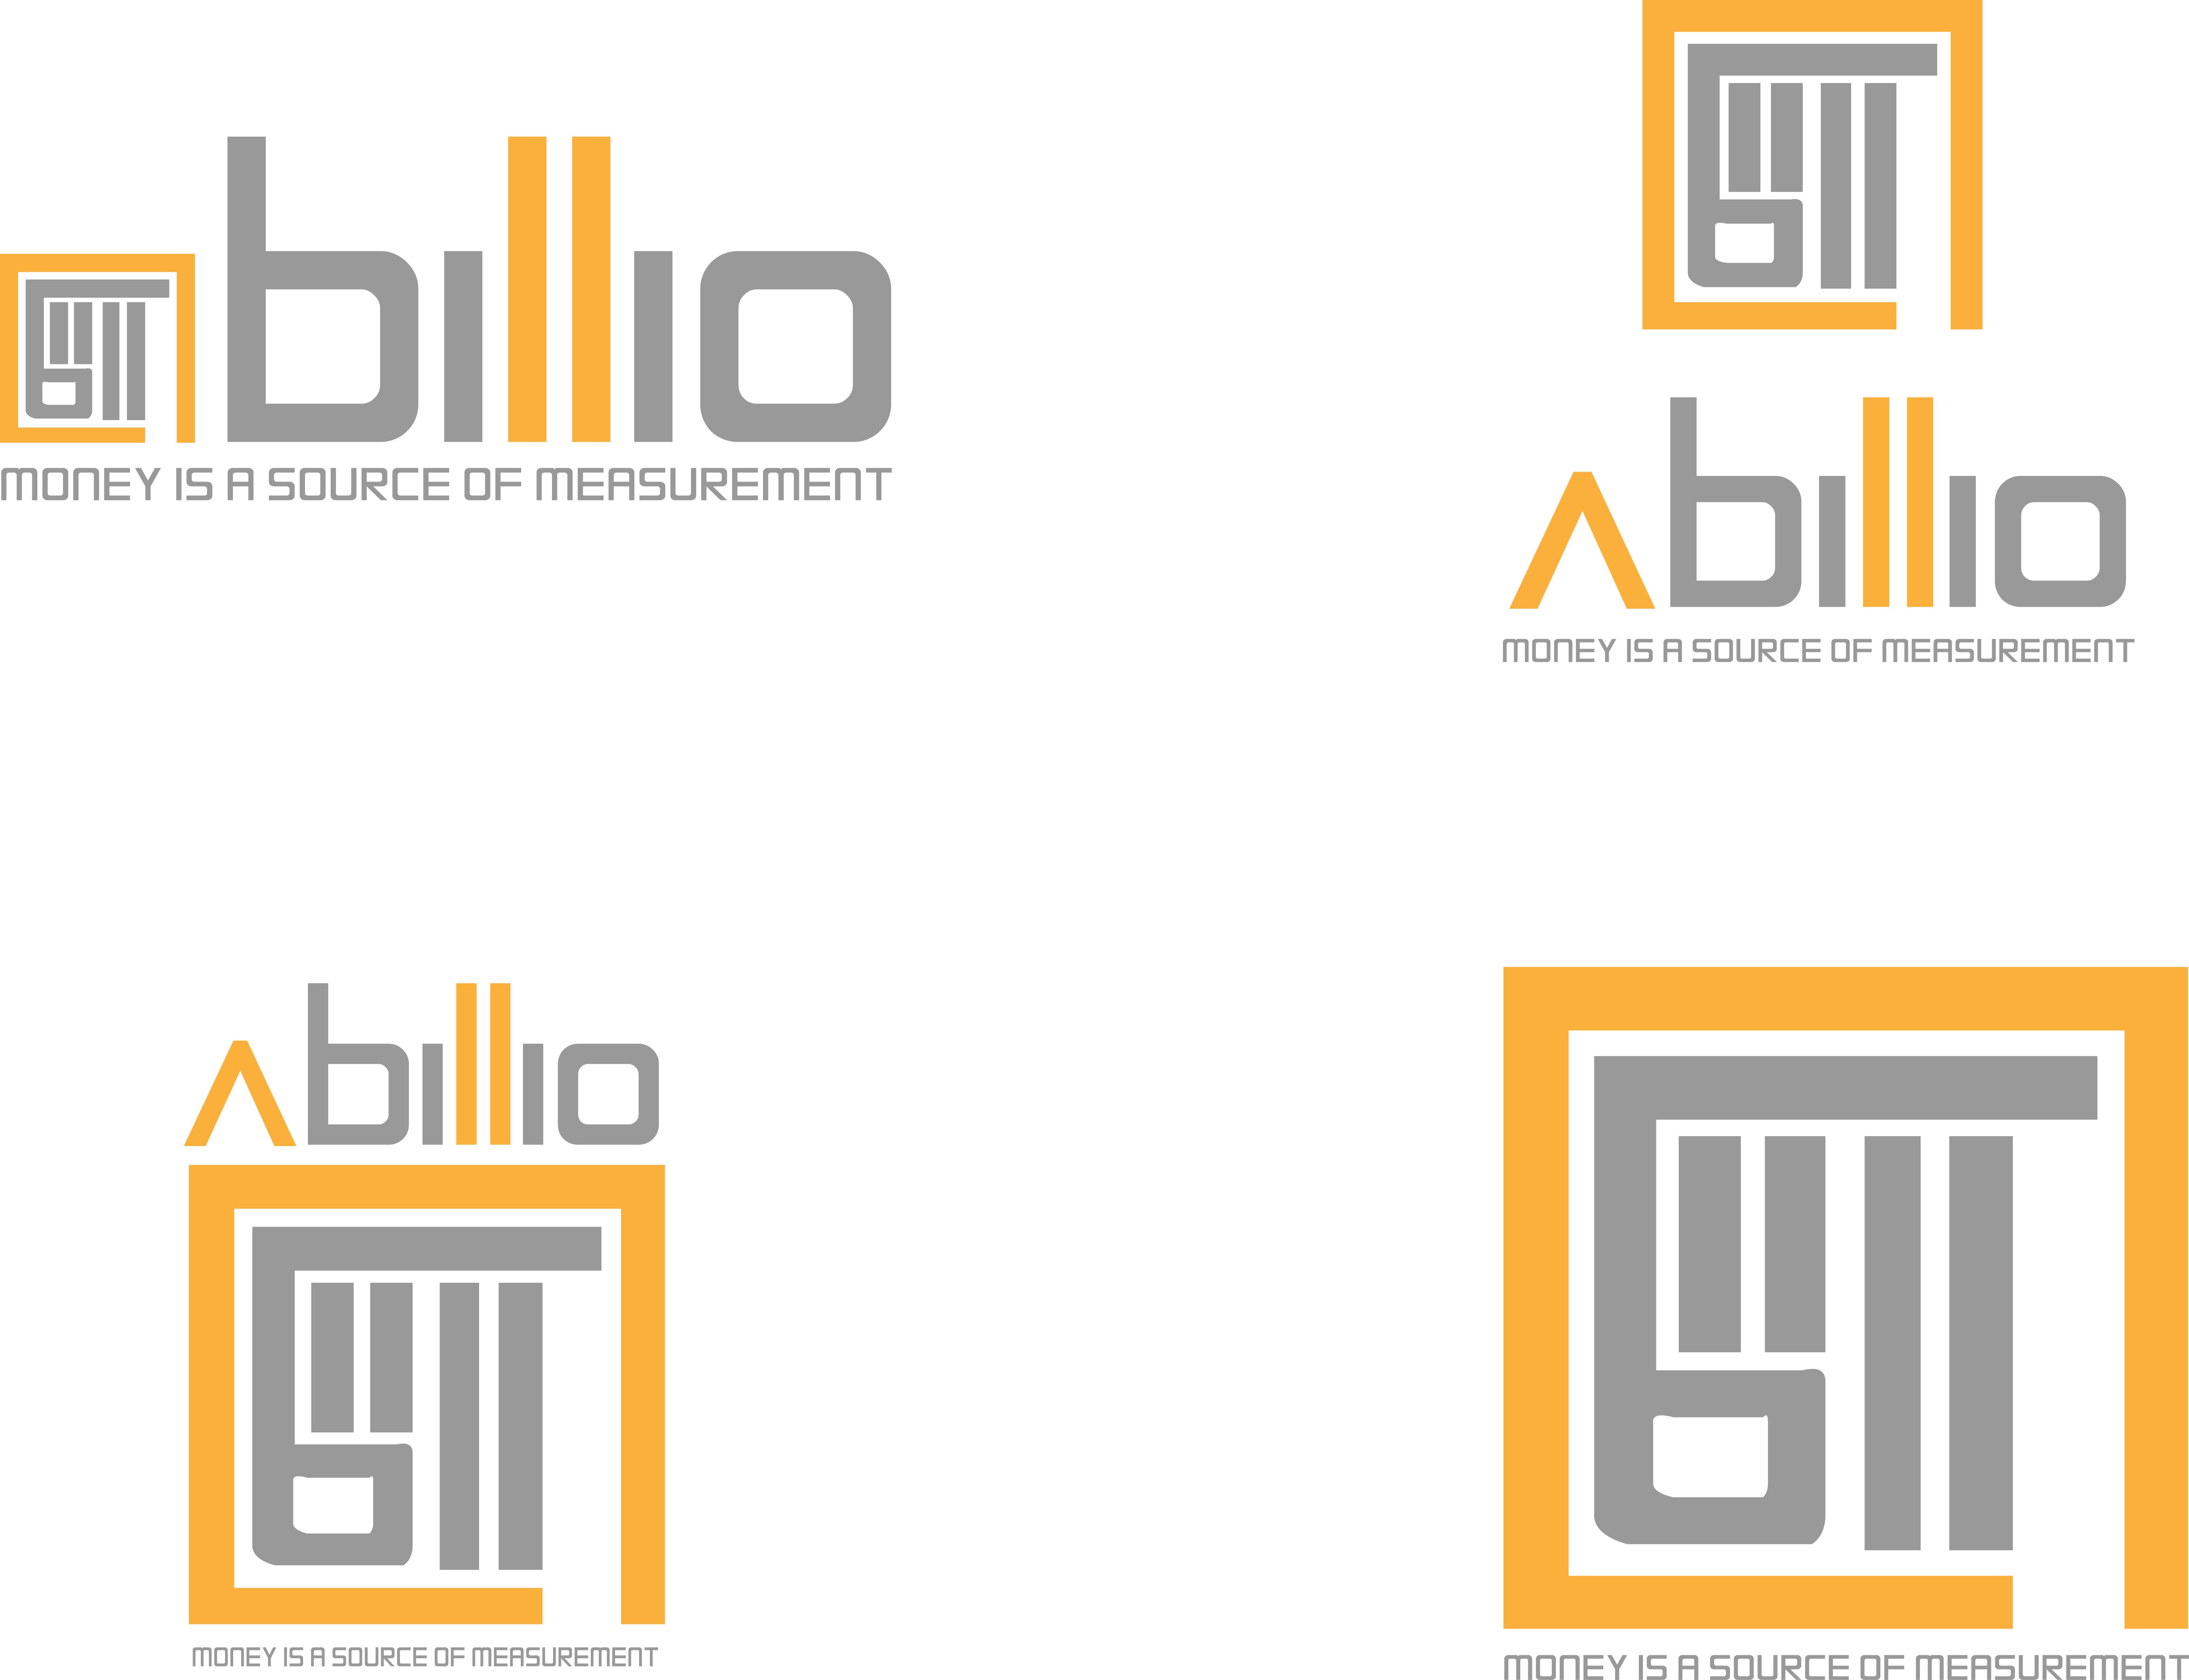 Abillio_Logo-Grey-and-Gold.jpg